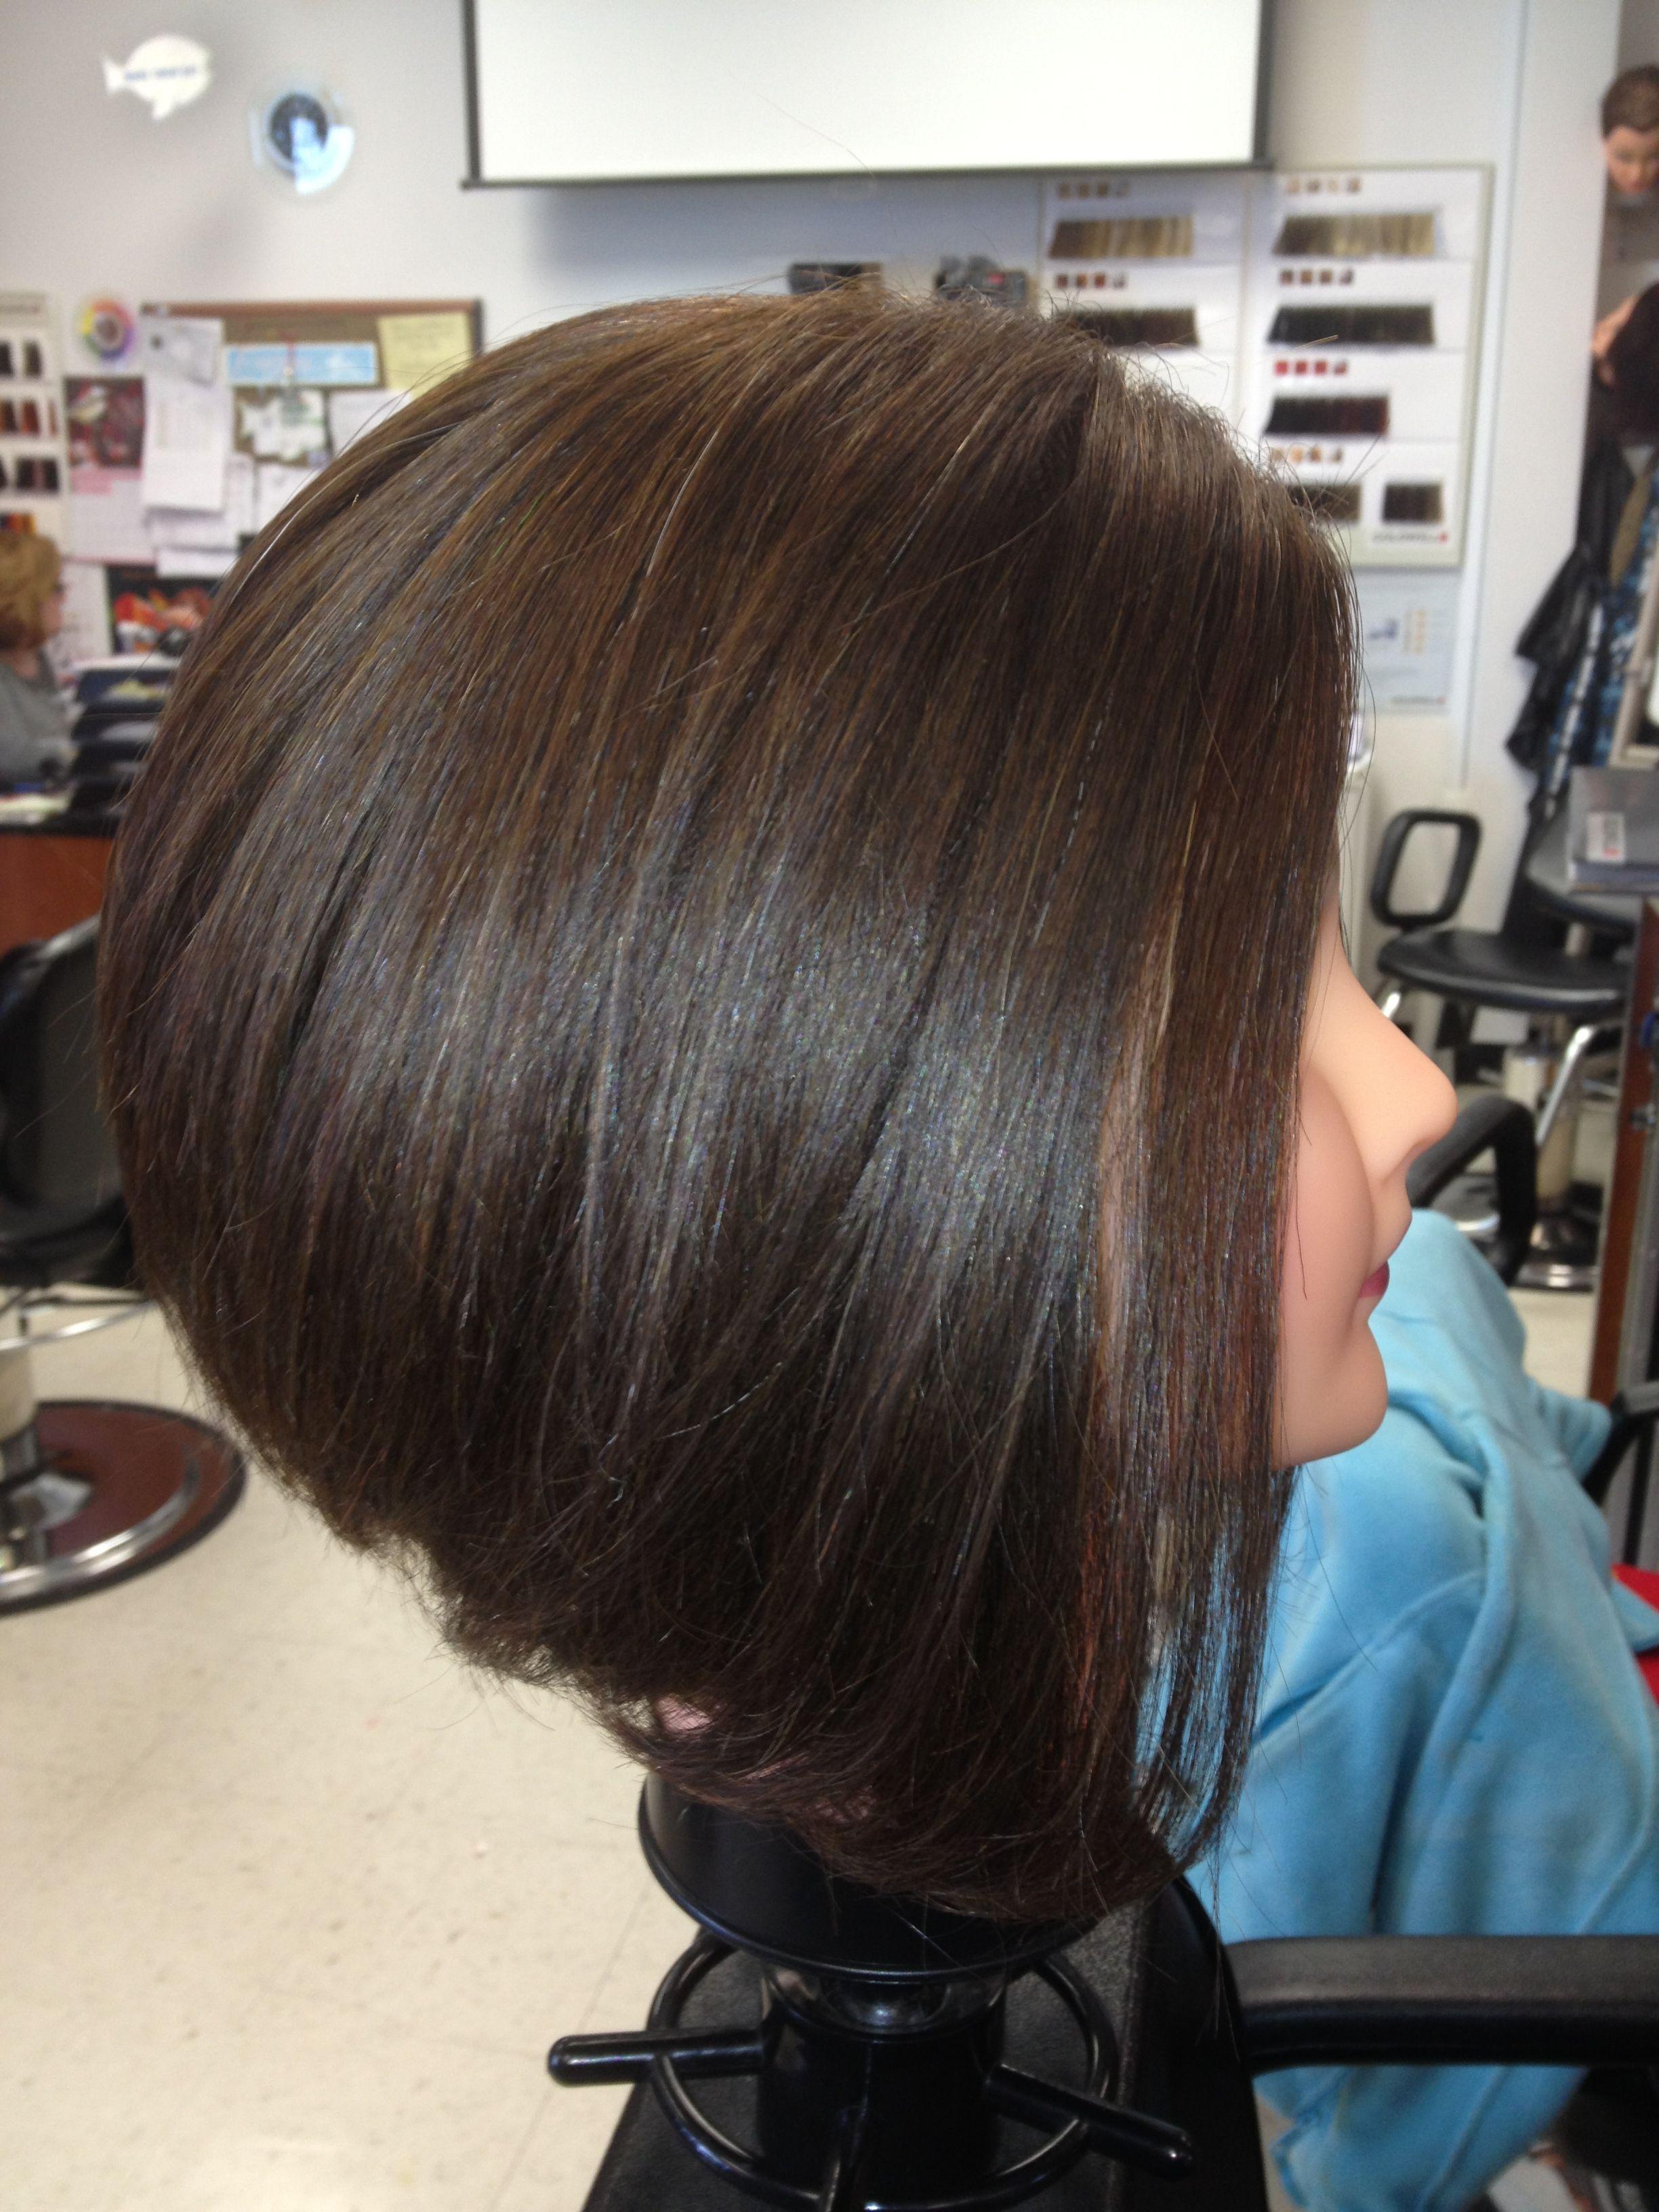 Hair Style Bob: Inverted Bob Medium Length #shorthair #cute Love My Job